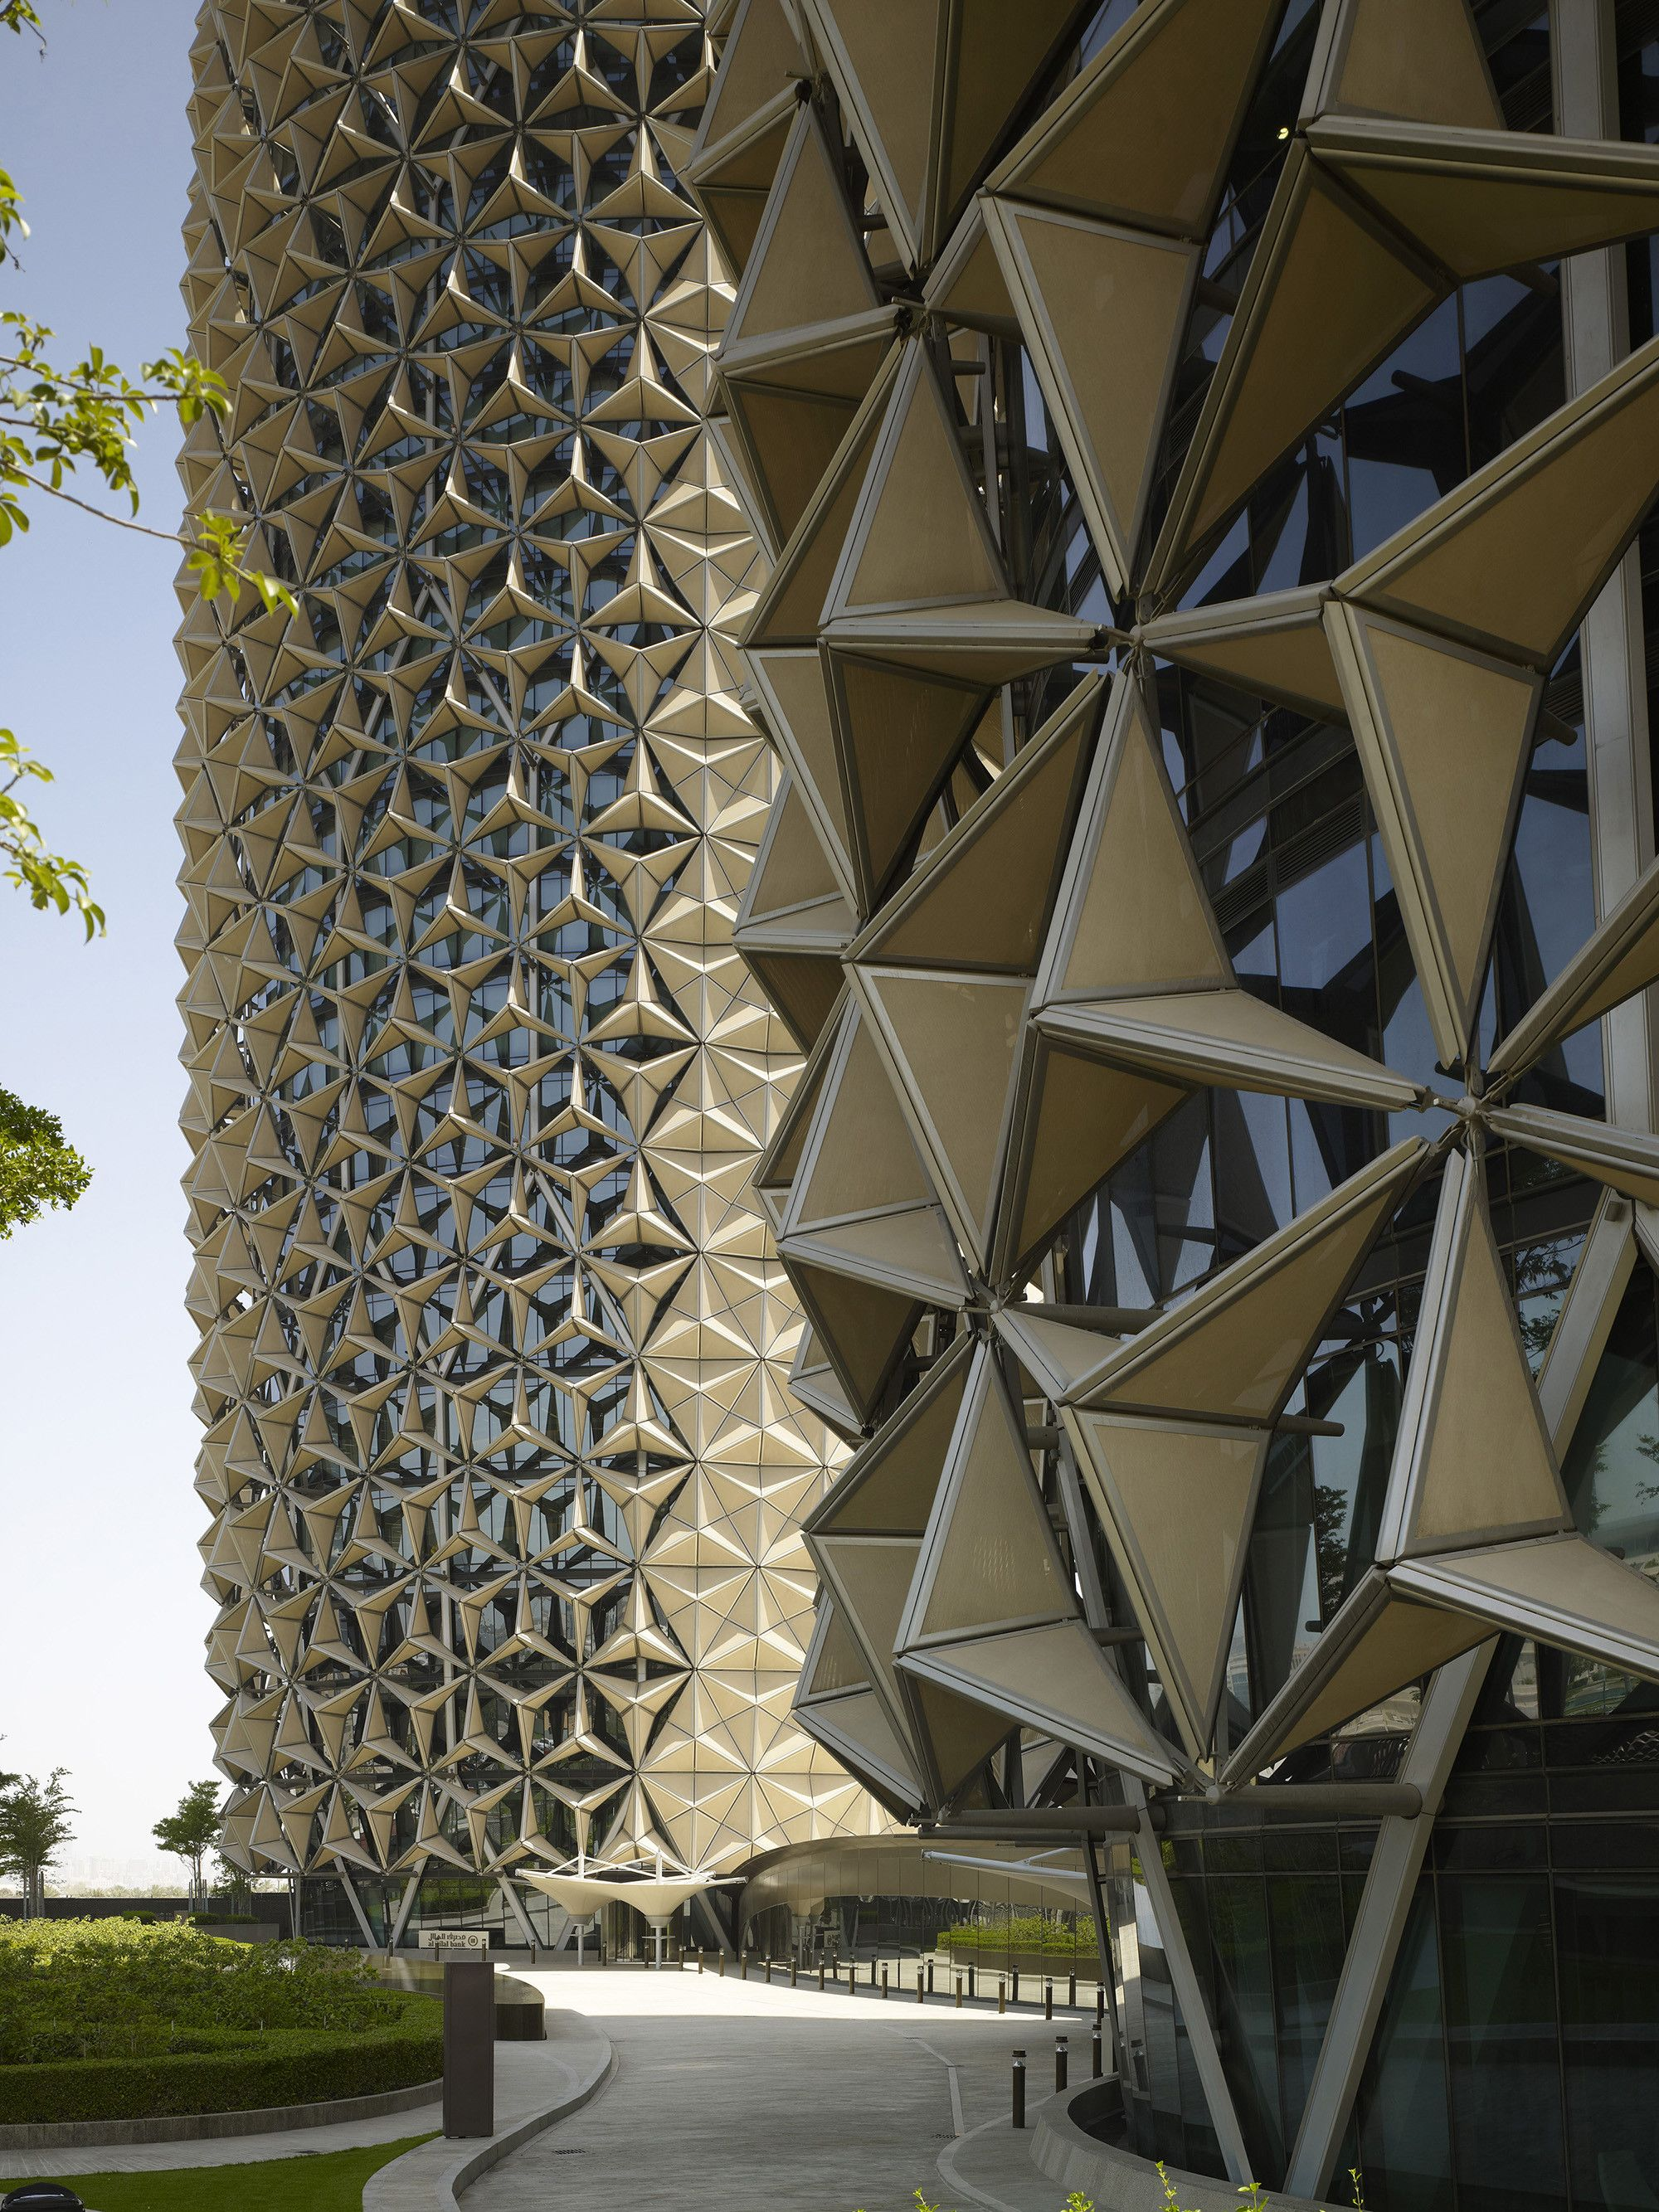 Gallery of Light Matters Mashrabiyas Translating